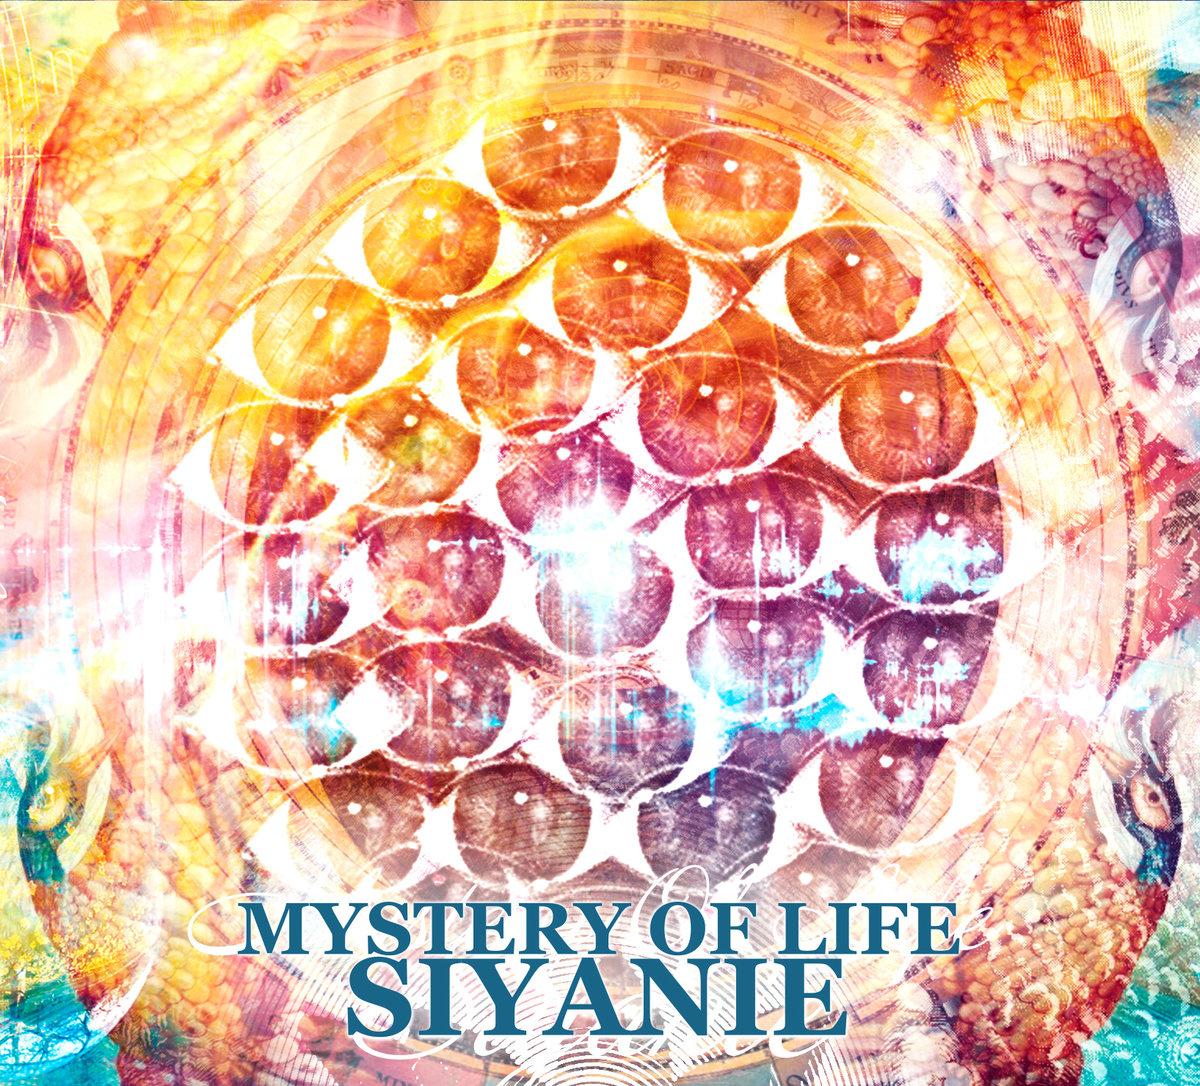 Siyanie - Mystery of Life